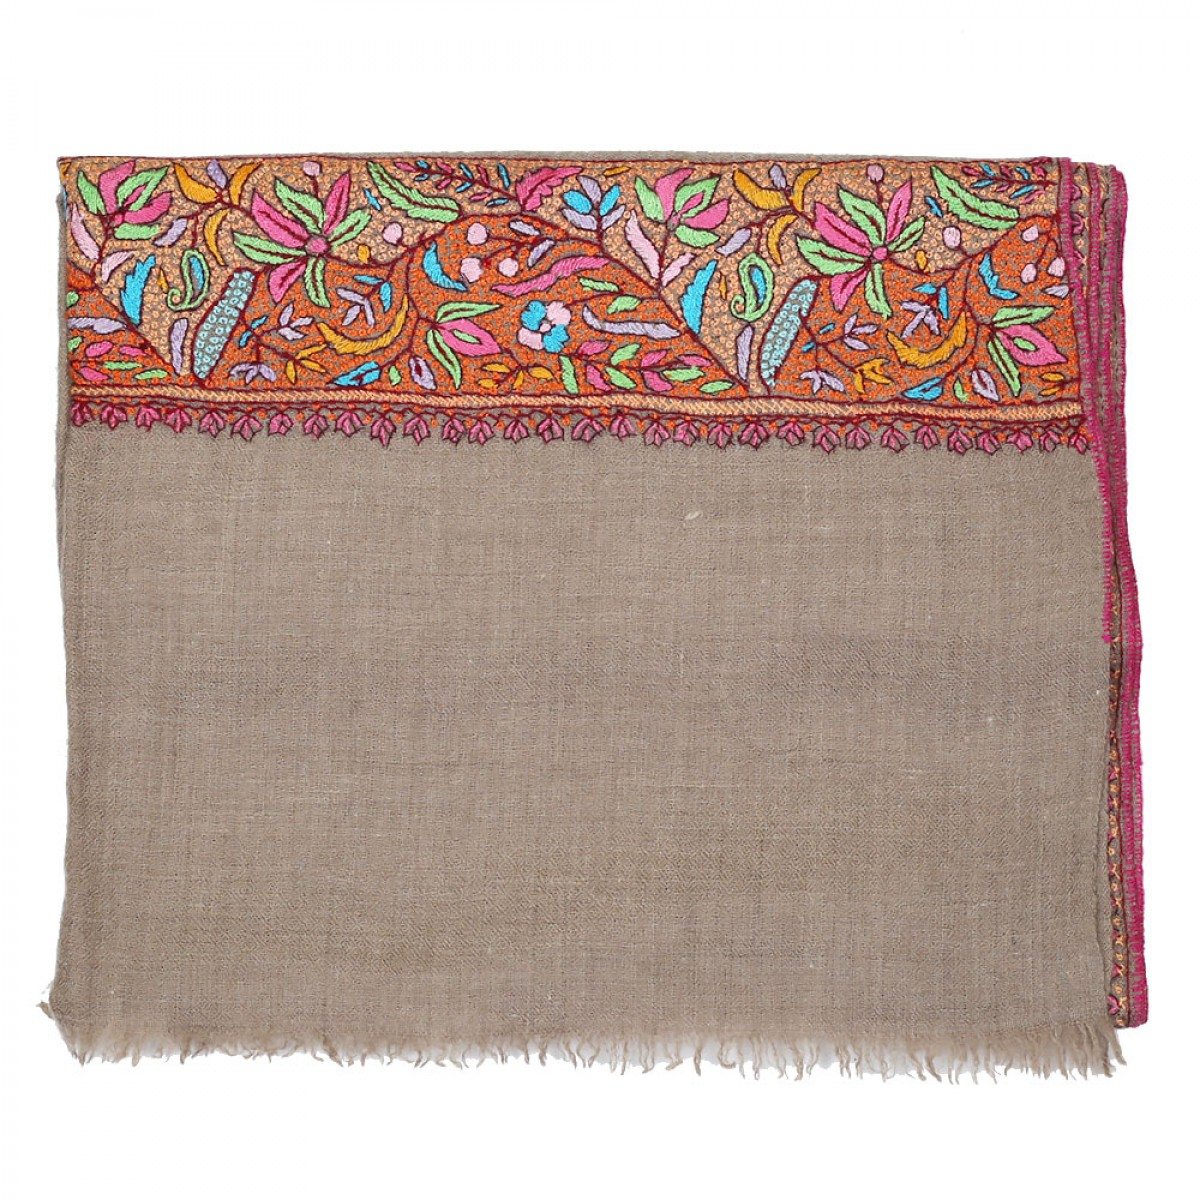 Embroidered Handloom Pashmina Stole - Camel